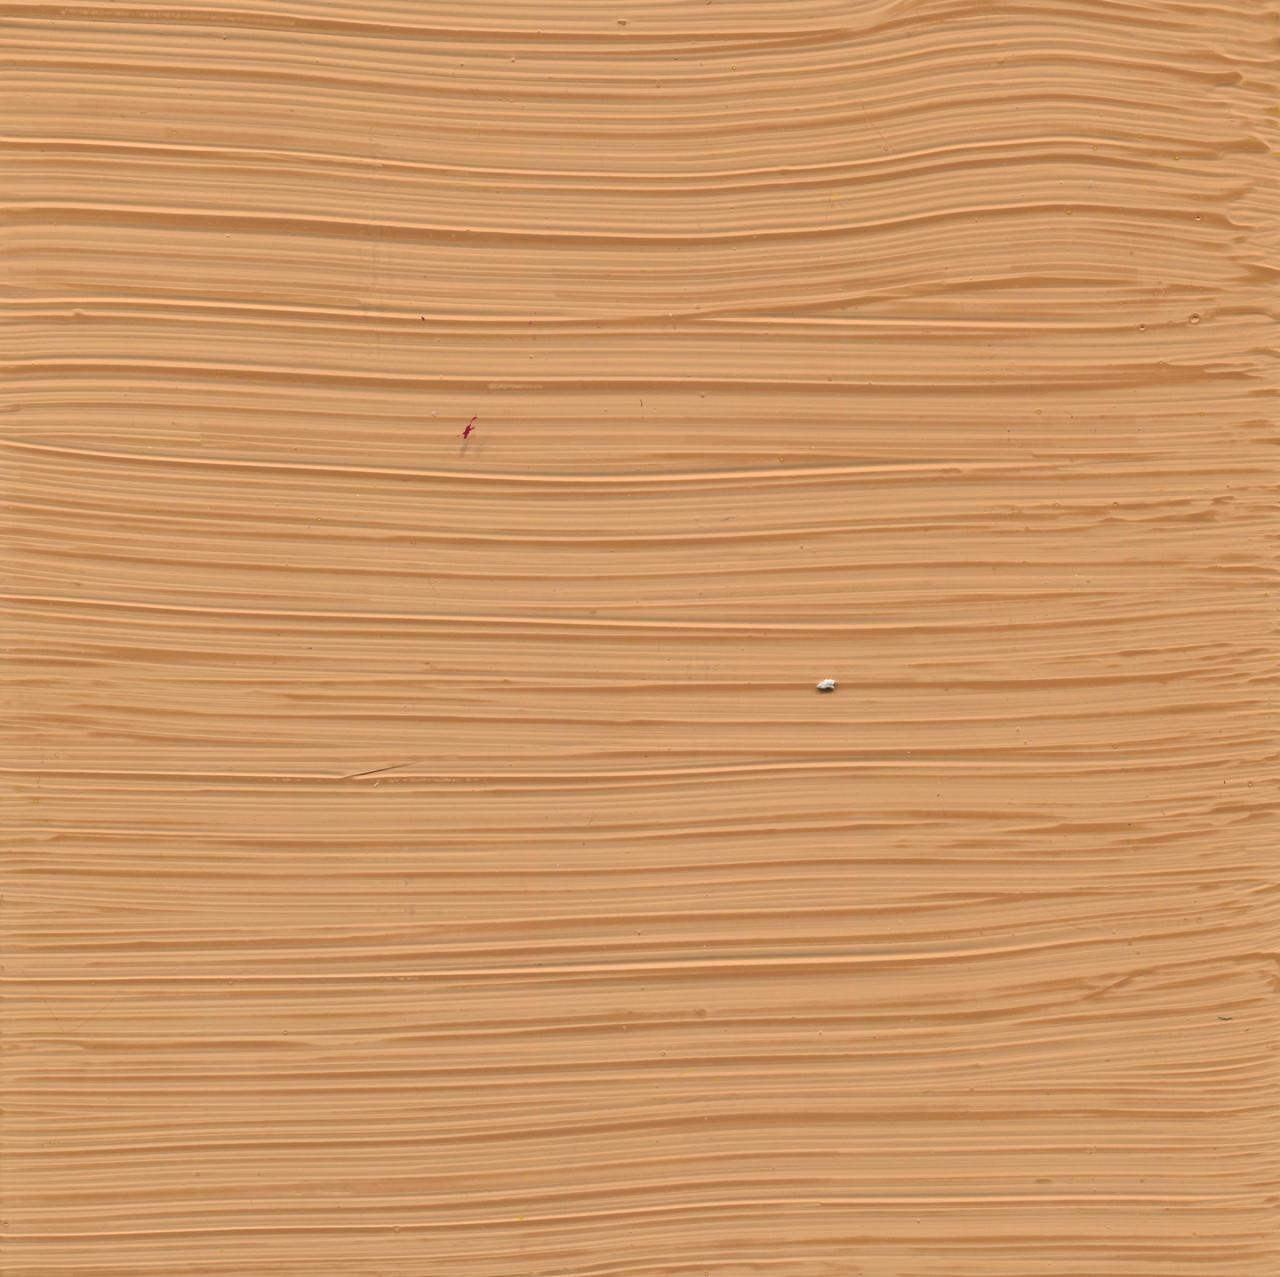 Venetian Plaster Texture Tinted Trowel and sponge application